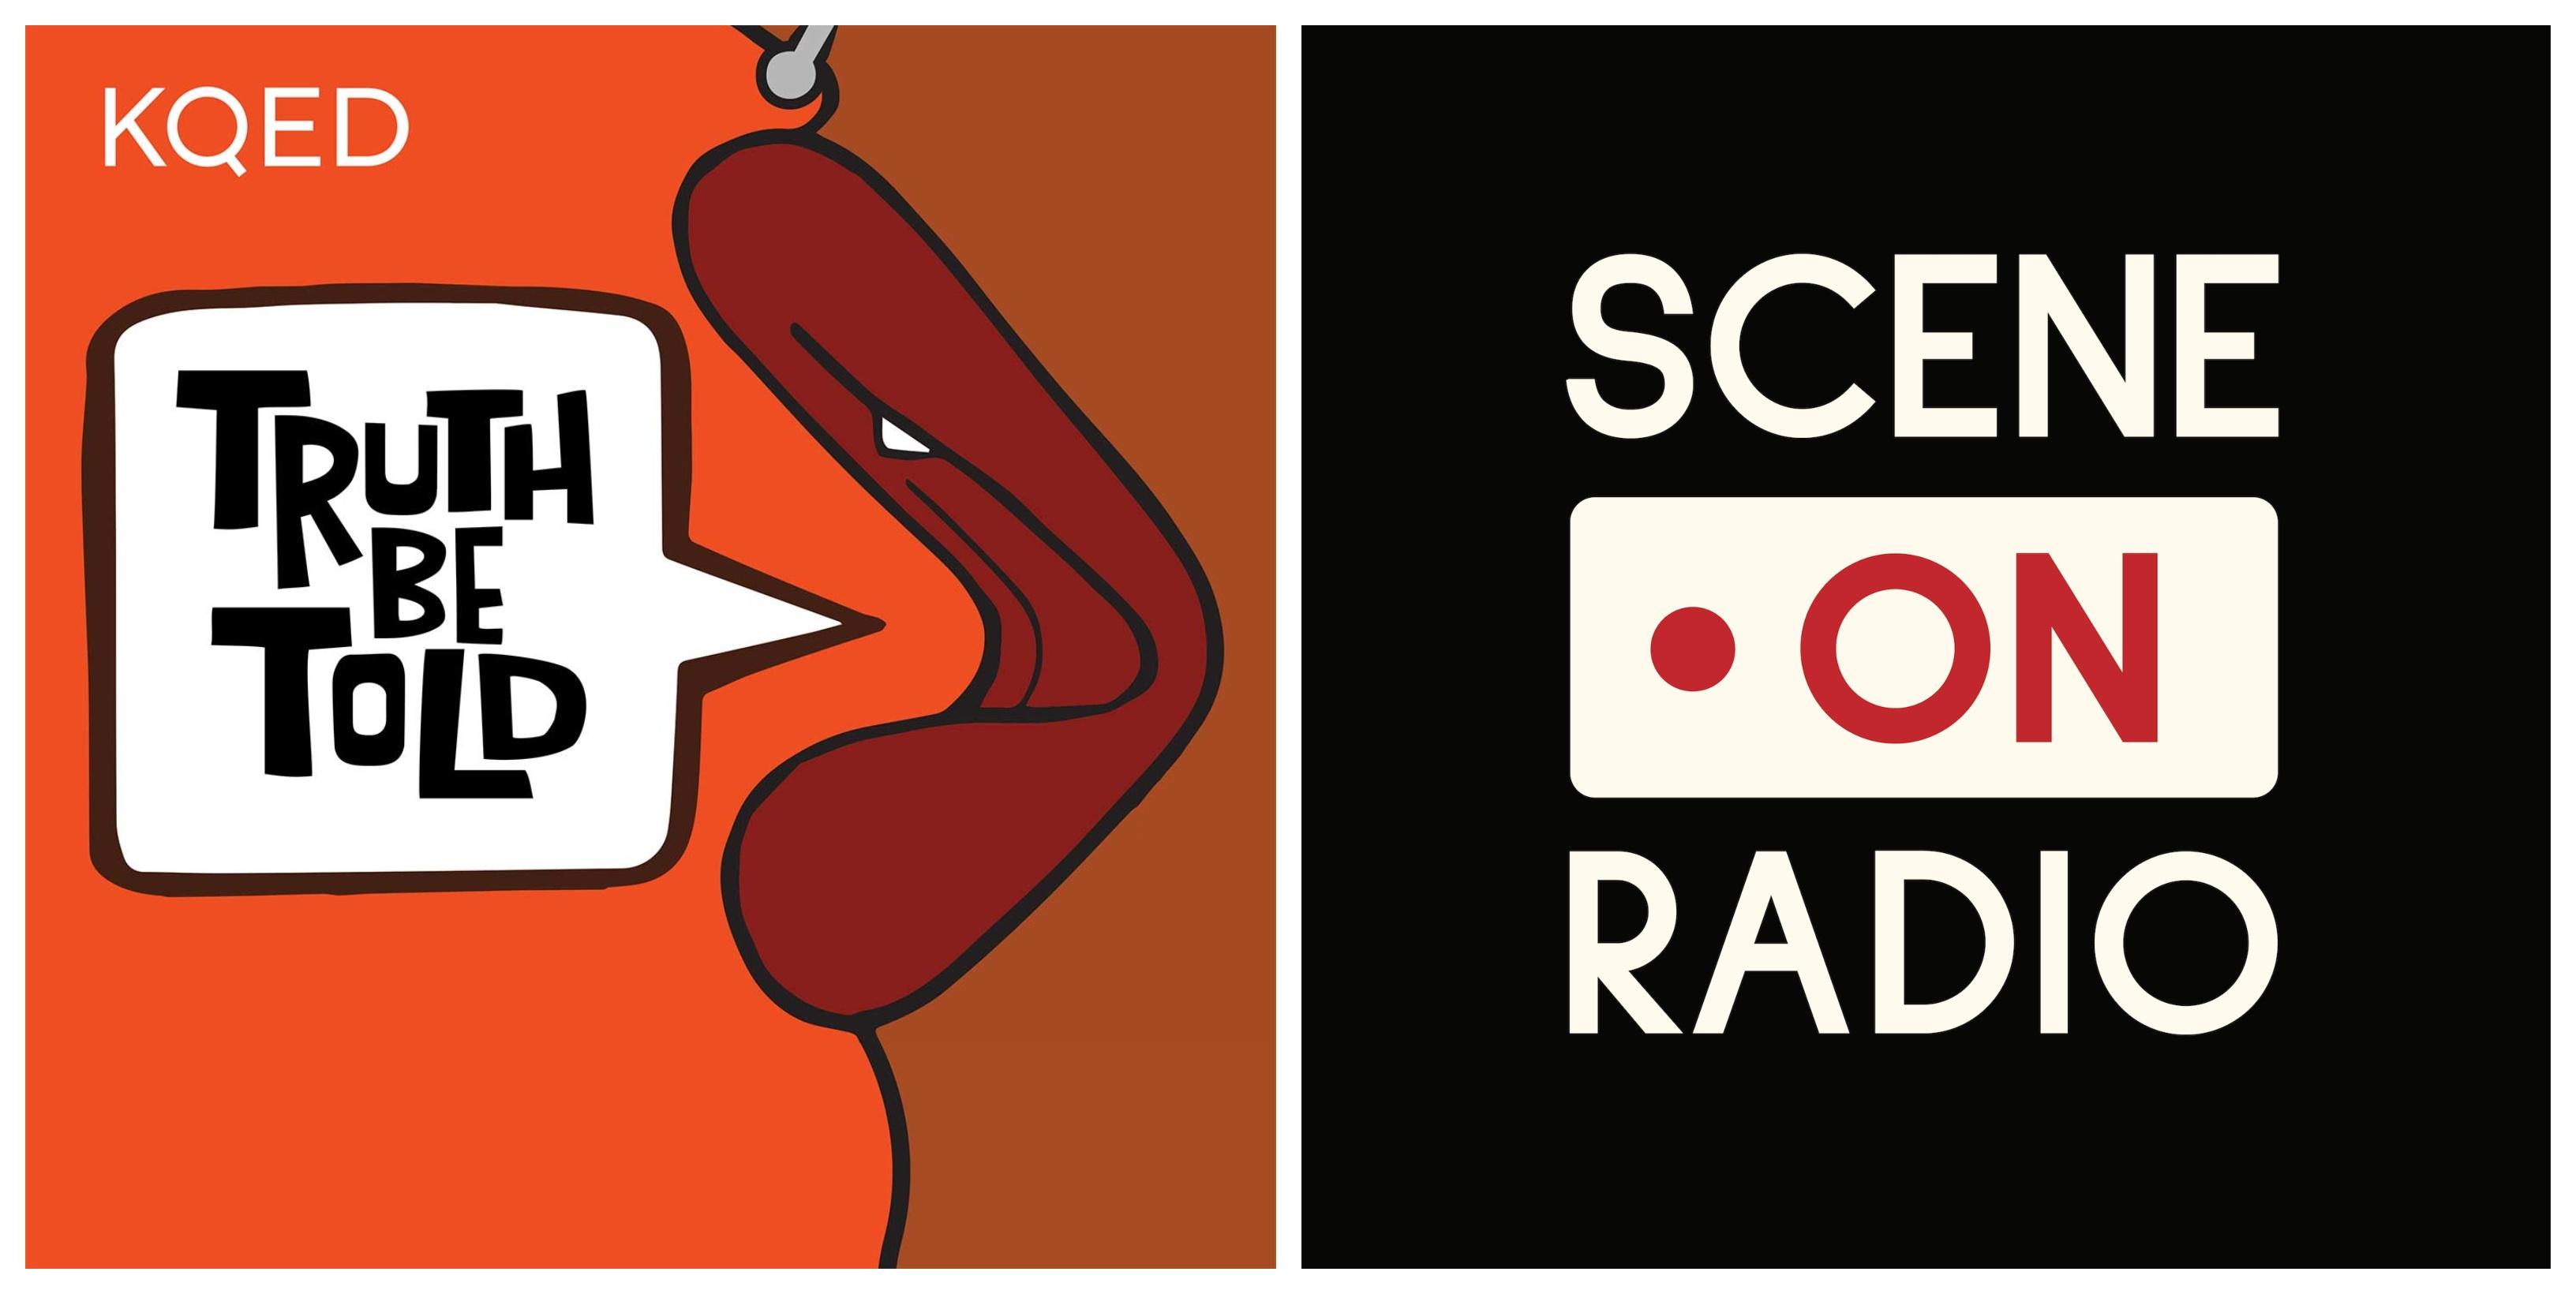 Truth Be Told - Scene on Radio